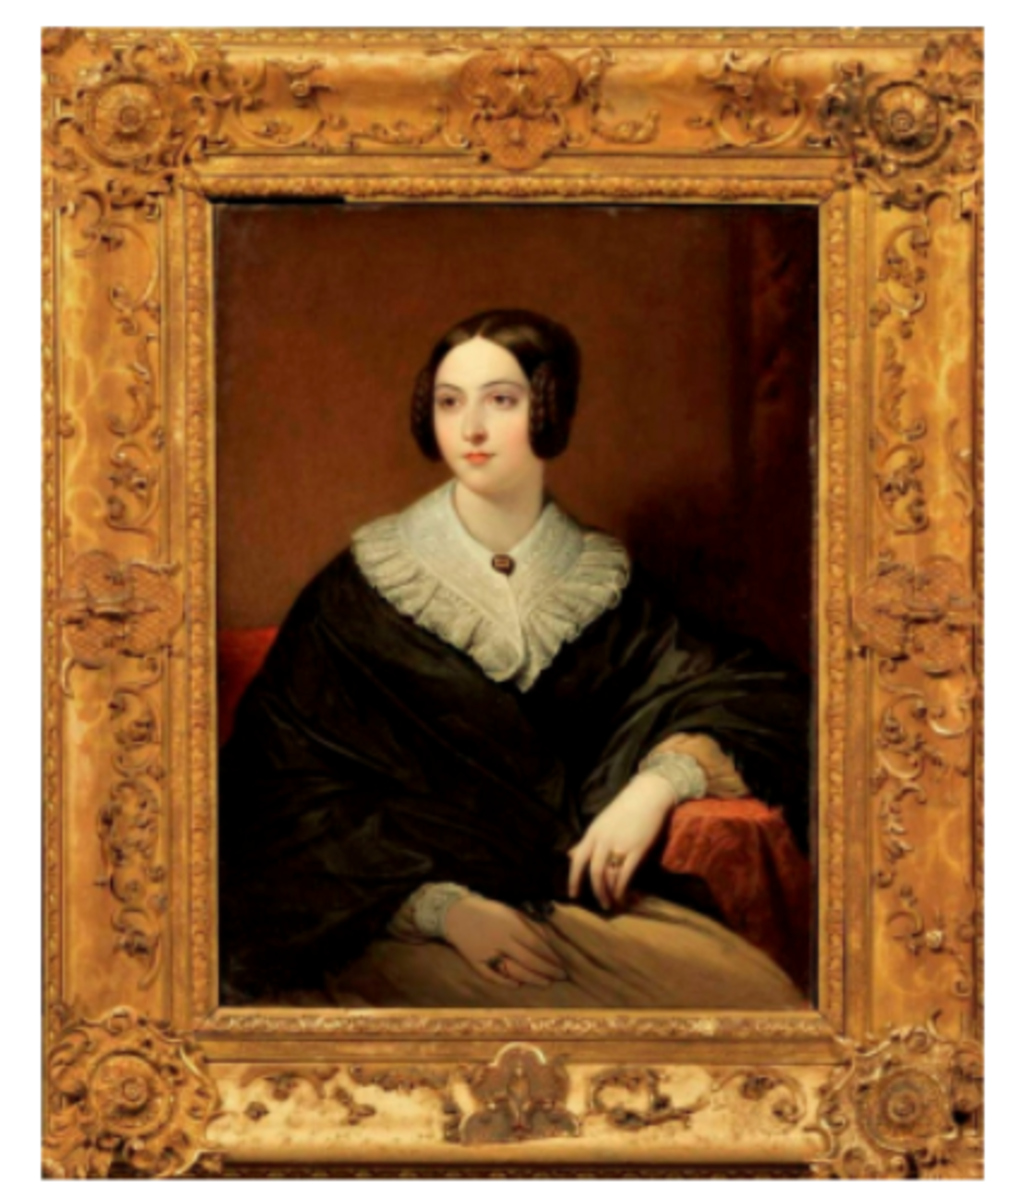 Gwendolyn Talbot, Princesse Borgheze